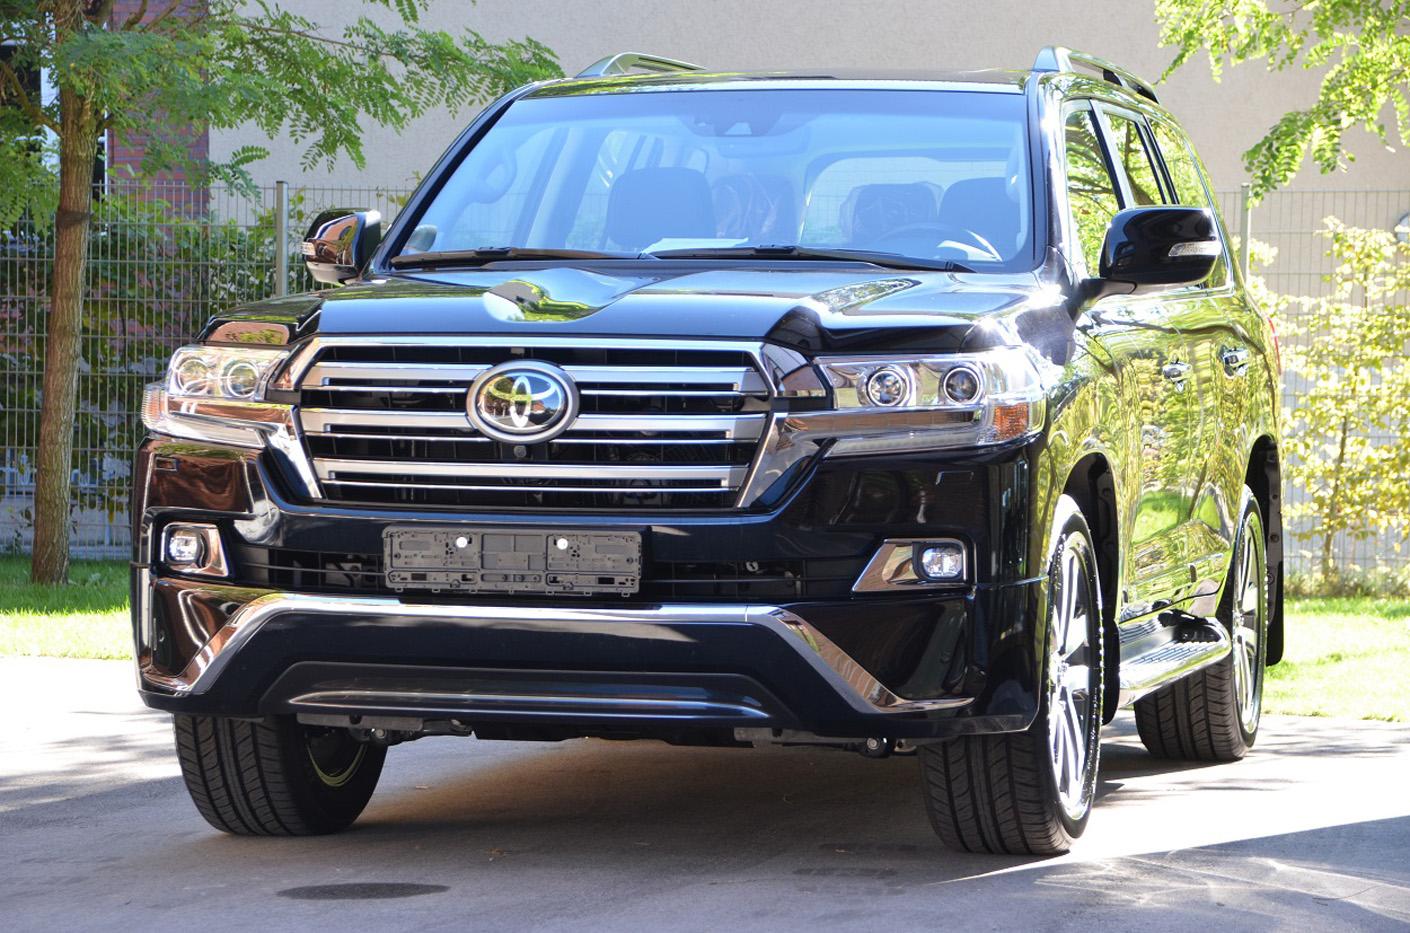 Kelebihan Toyota Land Cruiser 2018 Perbandingan Harga